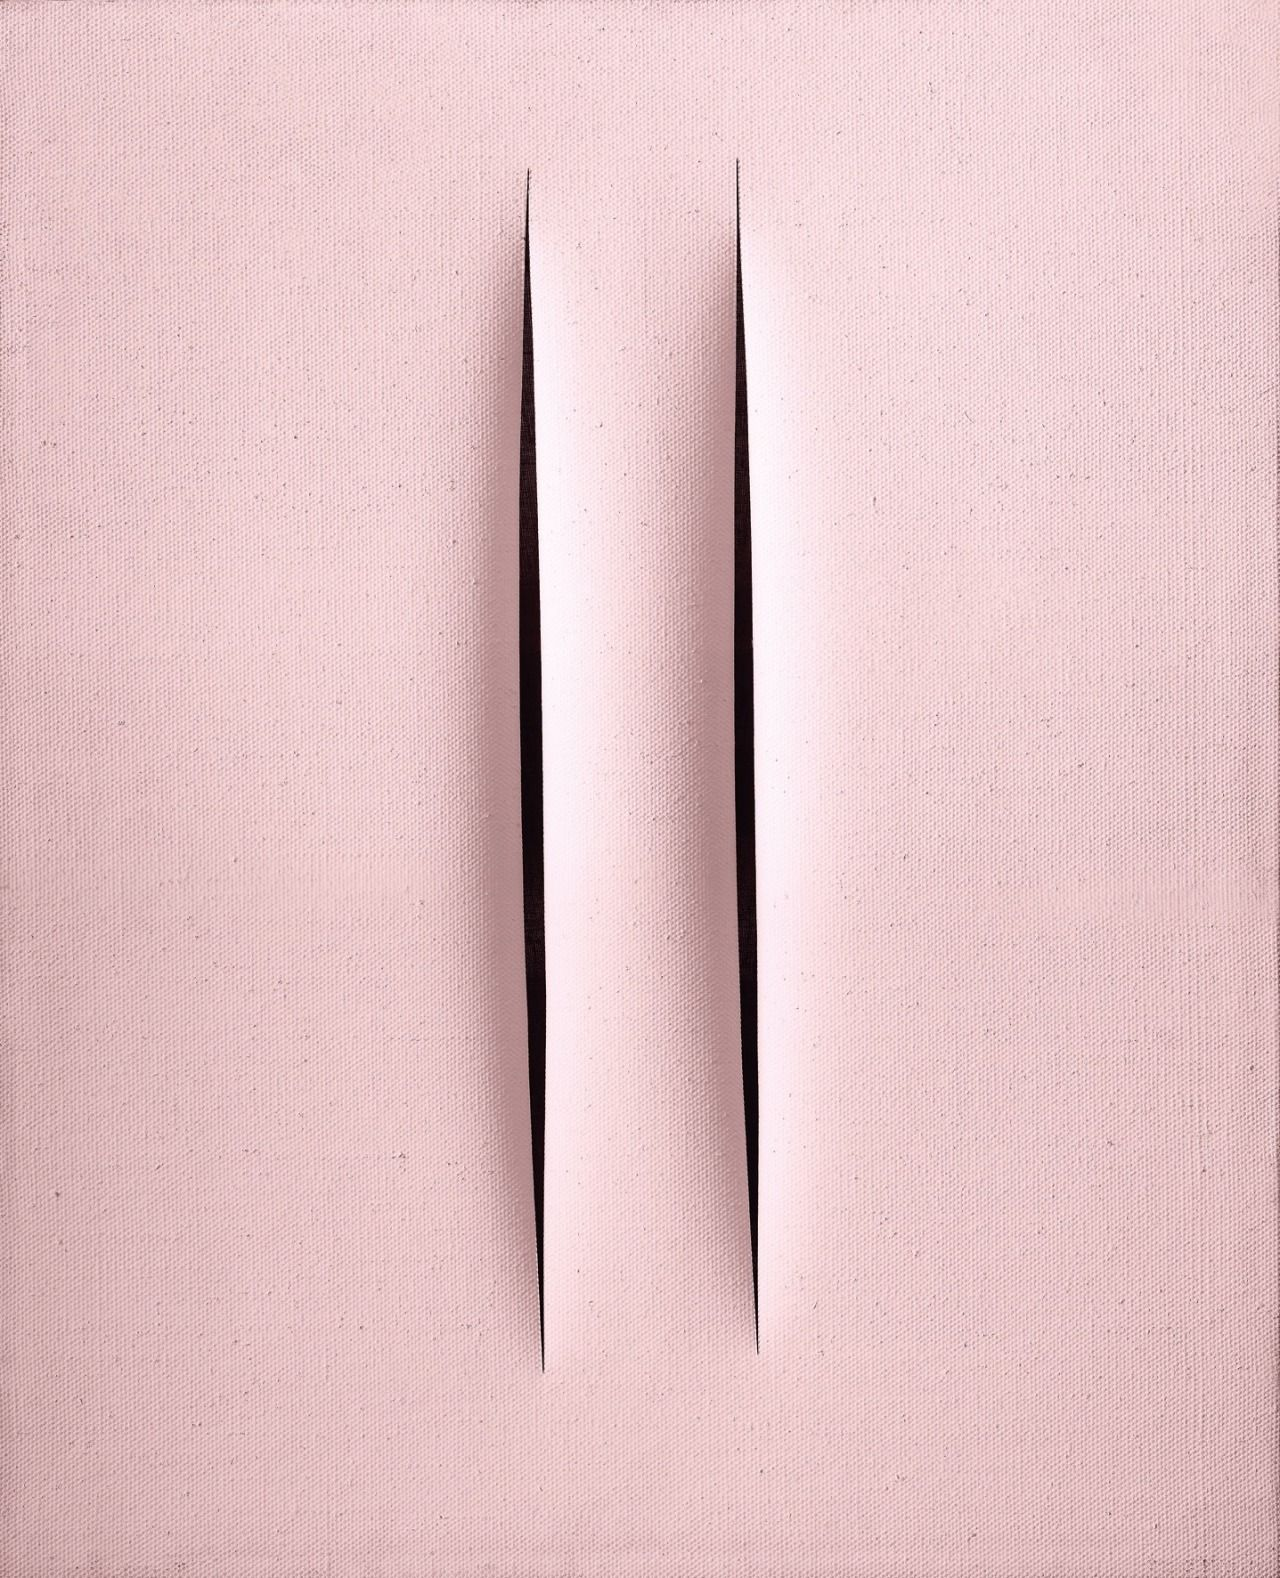 socialclaustrophobia:  Lucio Fontana (Argentinian/Italian, 1899–1968) / ConcettoSpaziale -Attese, 1968, emulsion paint on canvas, 61 × 50cm. viatigerlovemagic